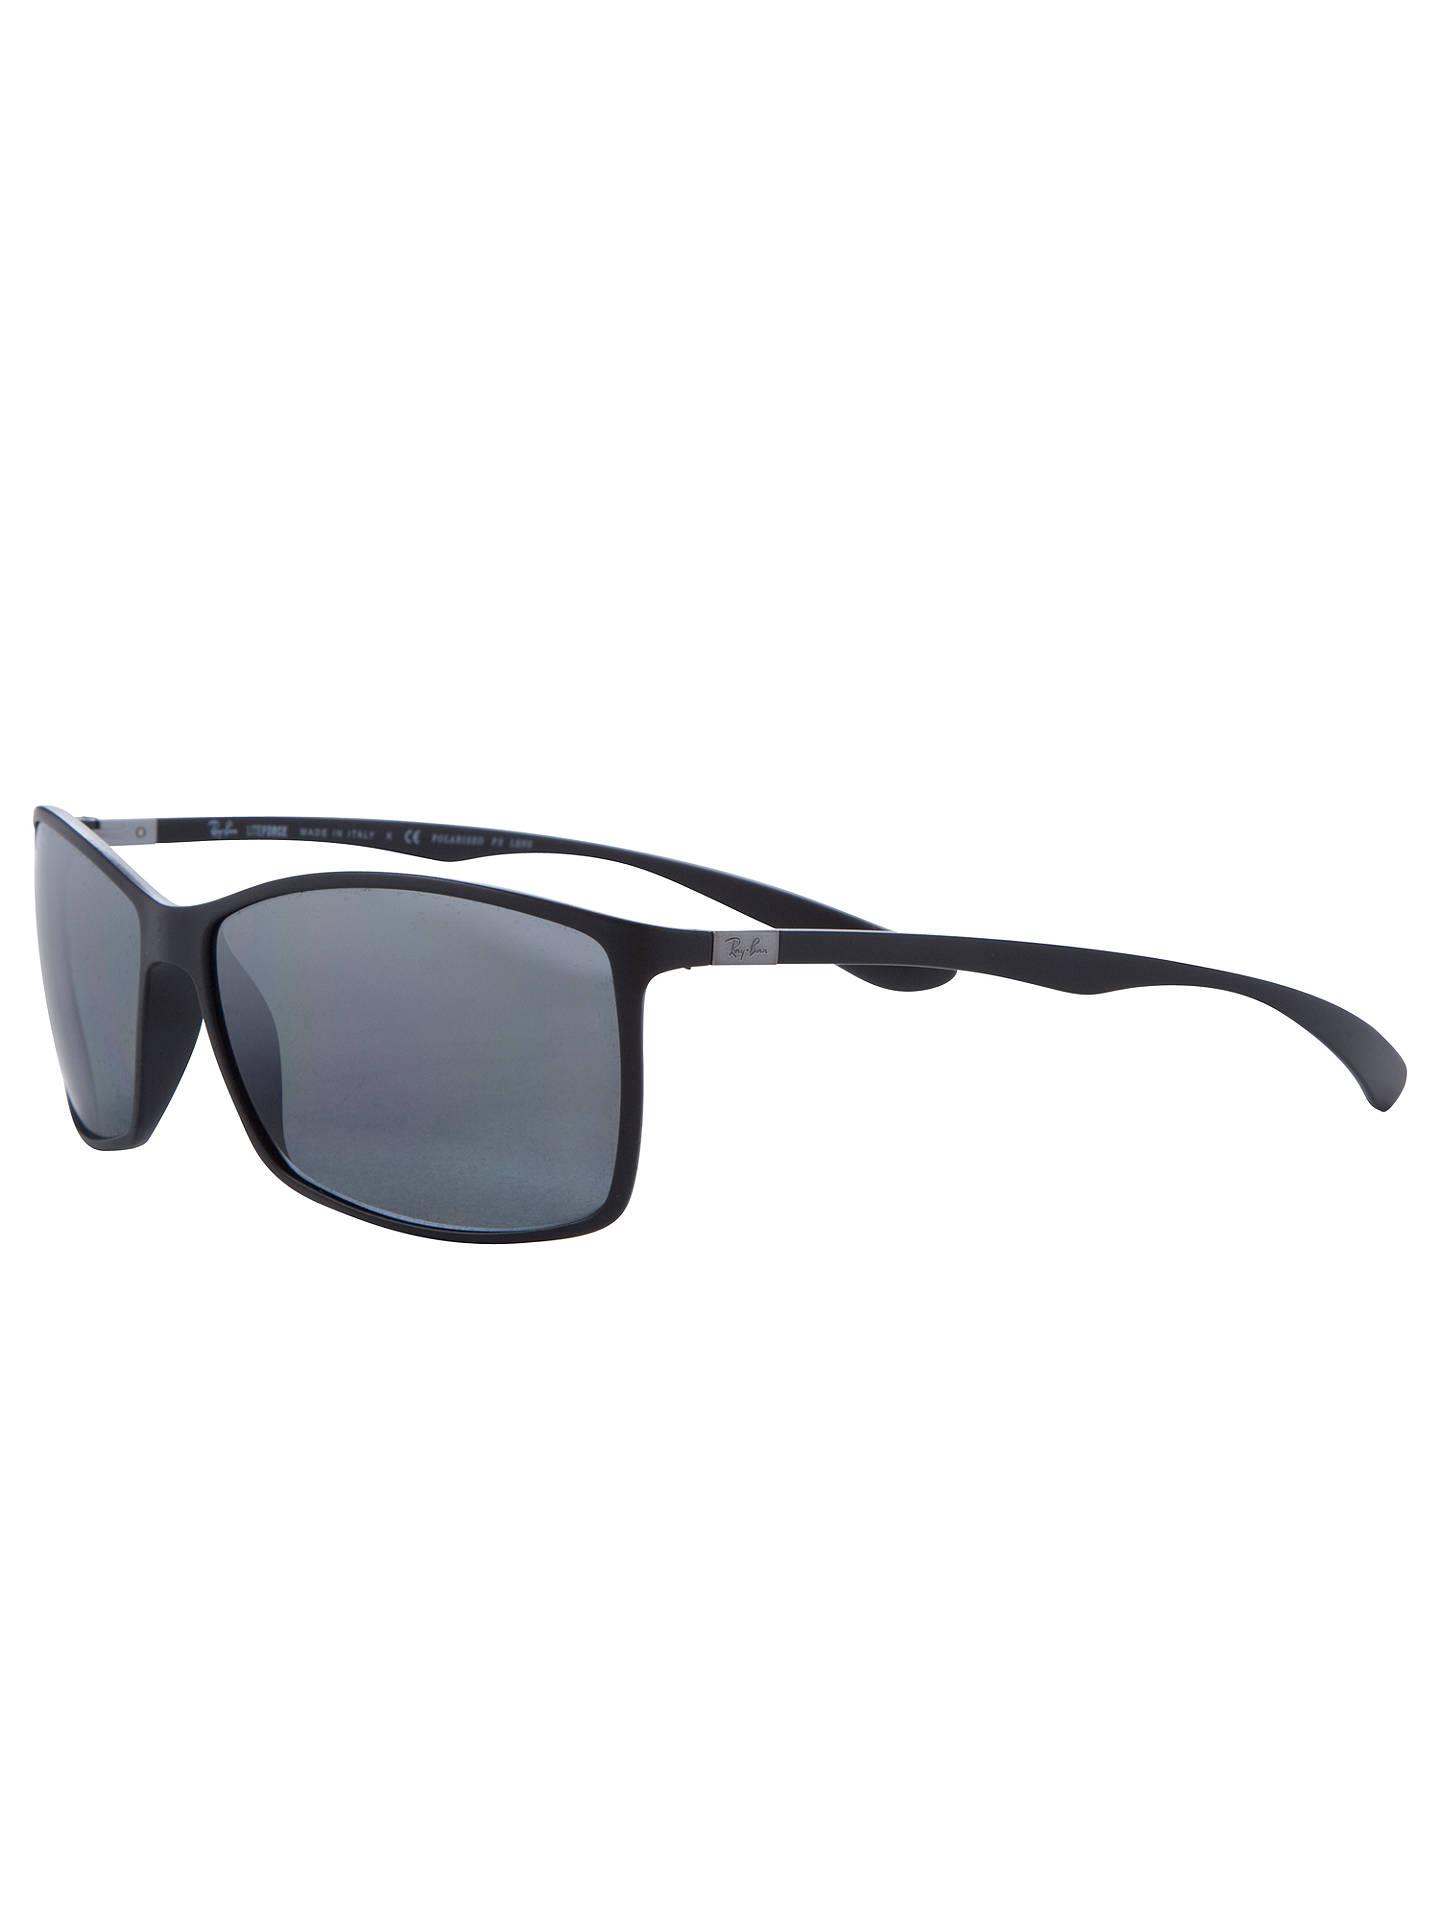 b8ade57f6c Ray-Ban RB4179 Men s Liteforce Tech Polarised Rectangular Sunglasses ...